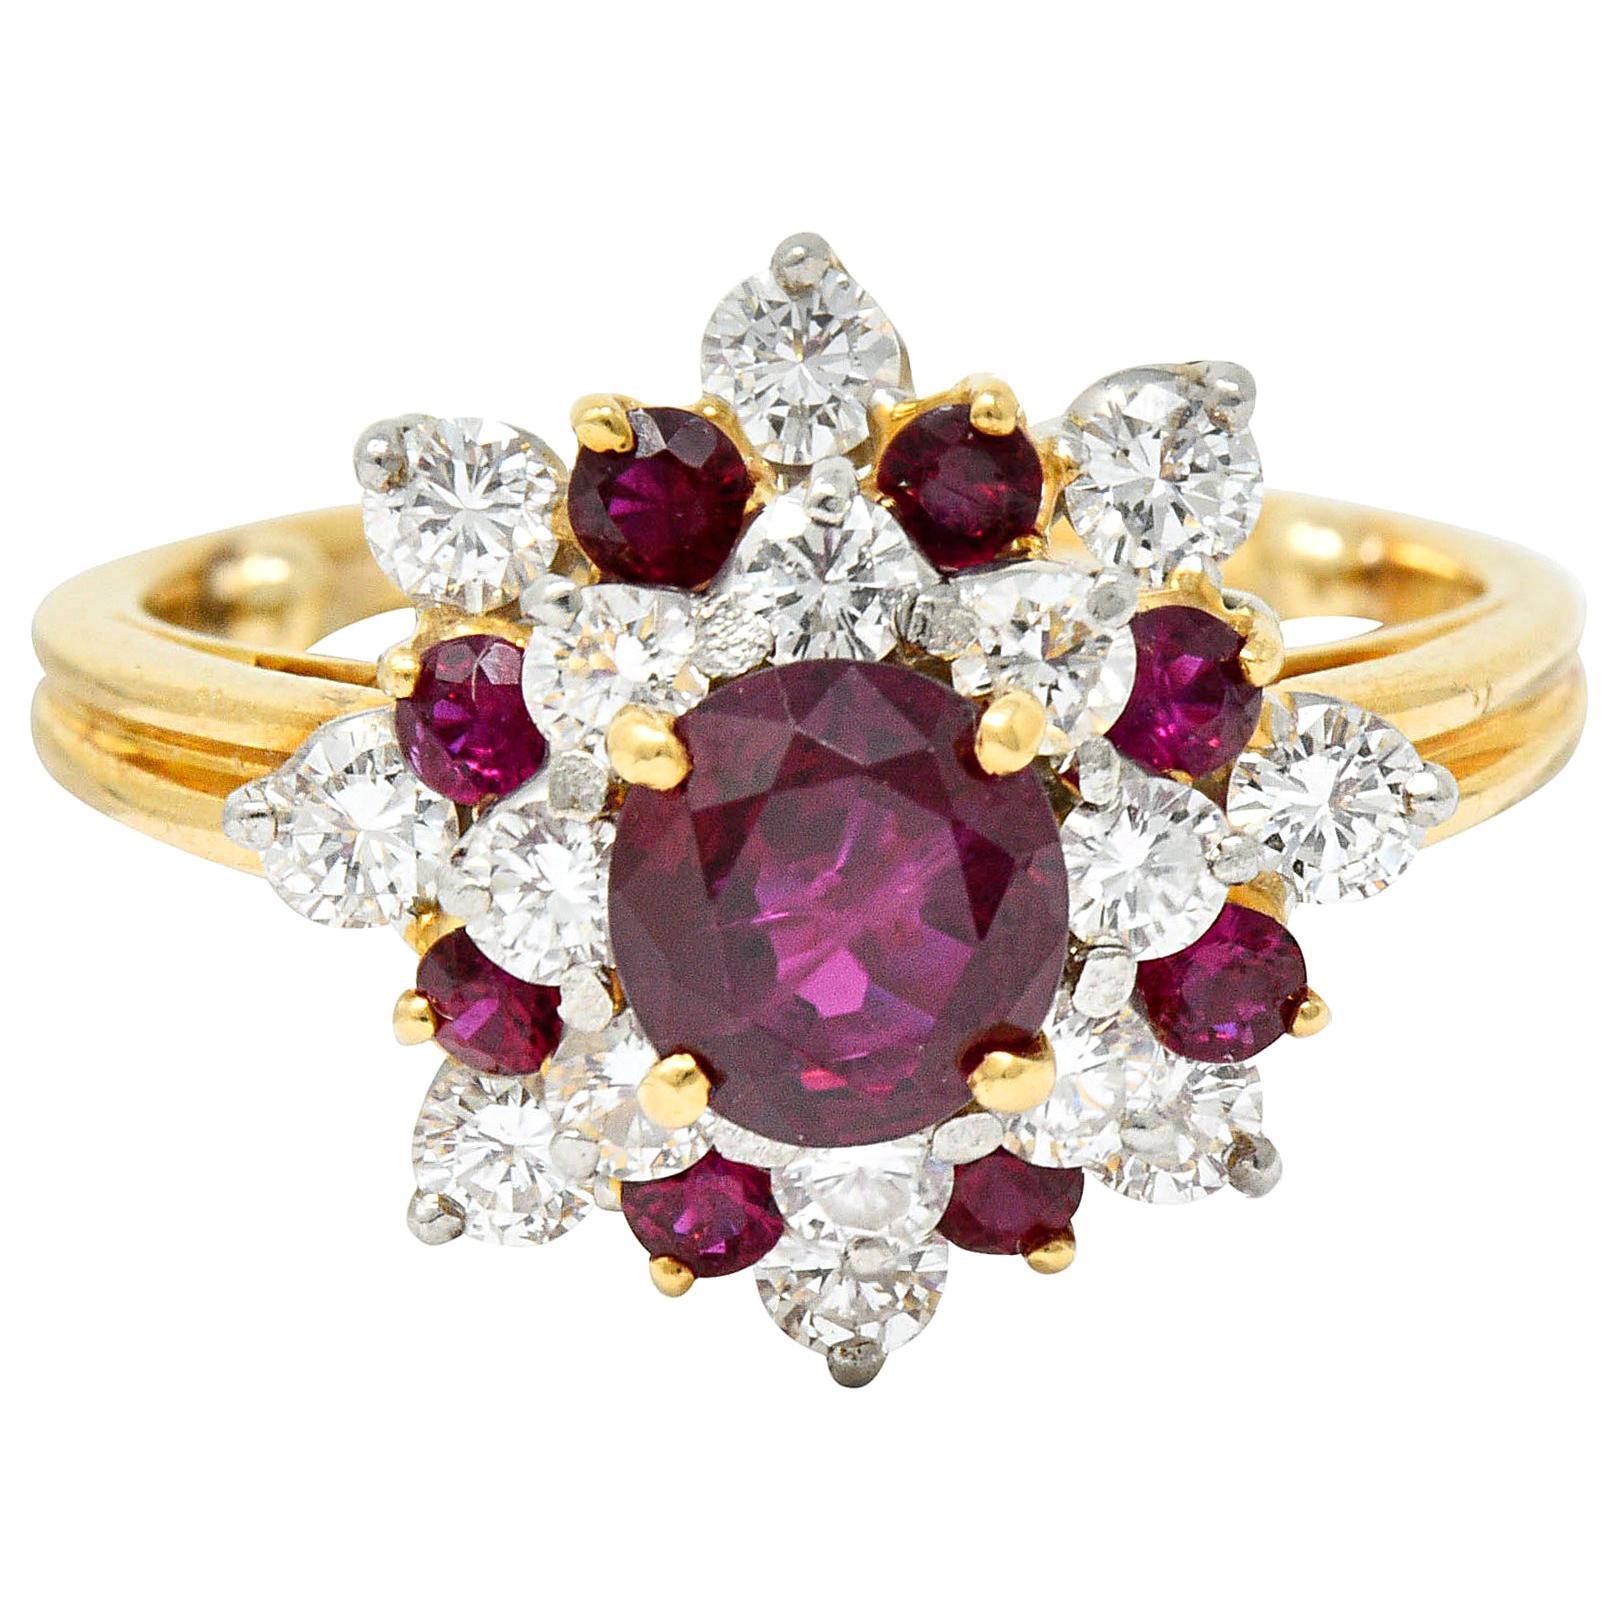 Oscar Heyman J.E. Caldwell Ruby Diamond 18 Karat Gold Platinum Cluster Ring GIA